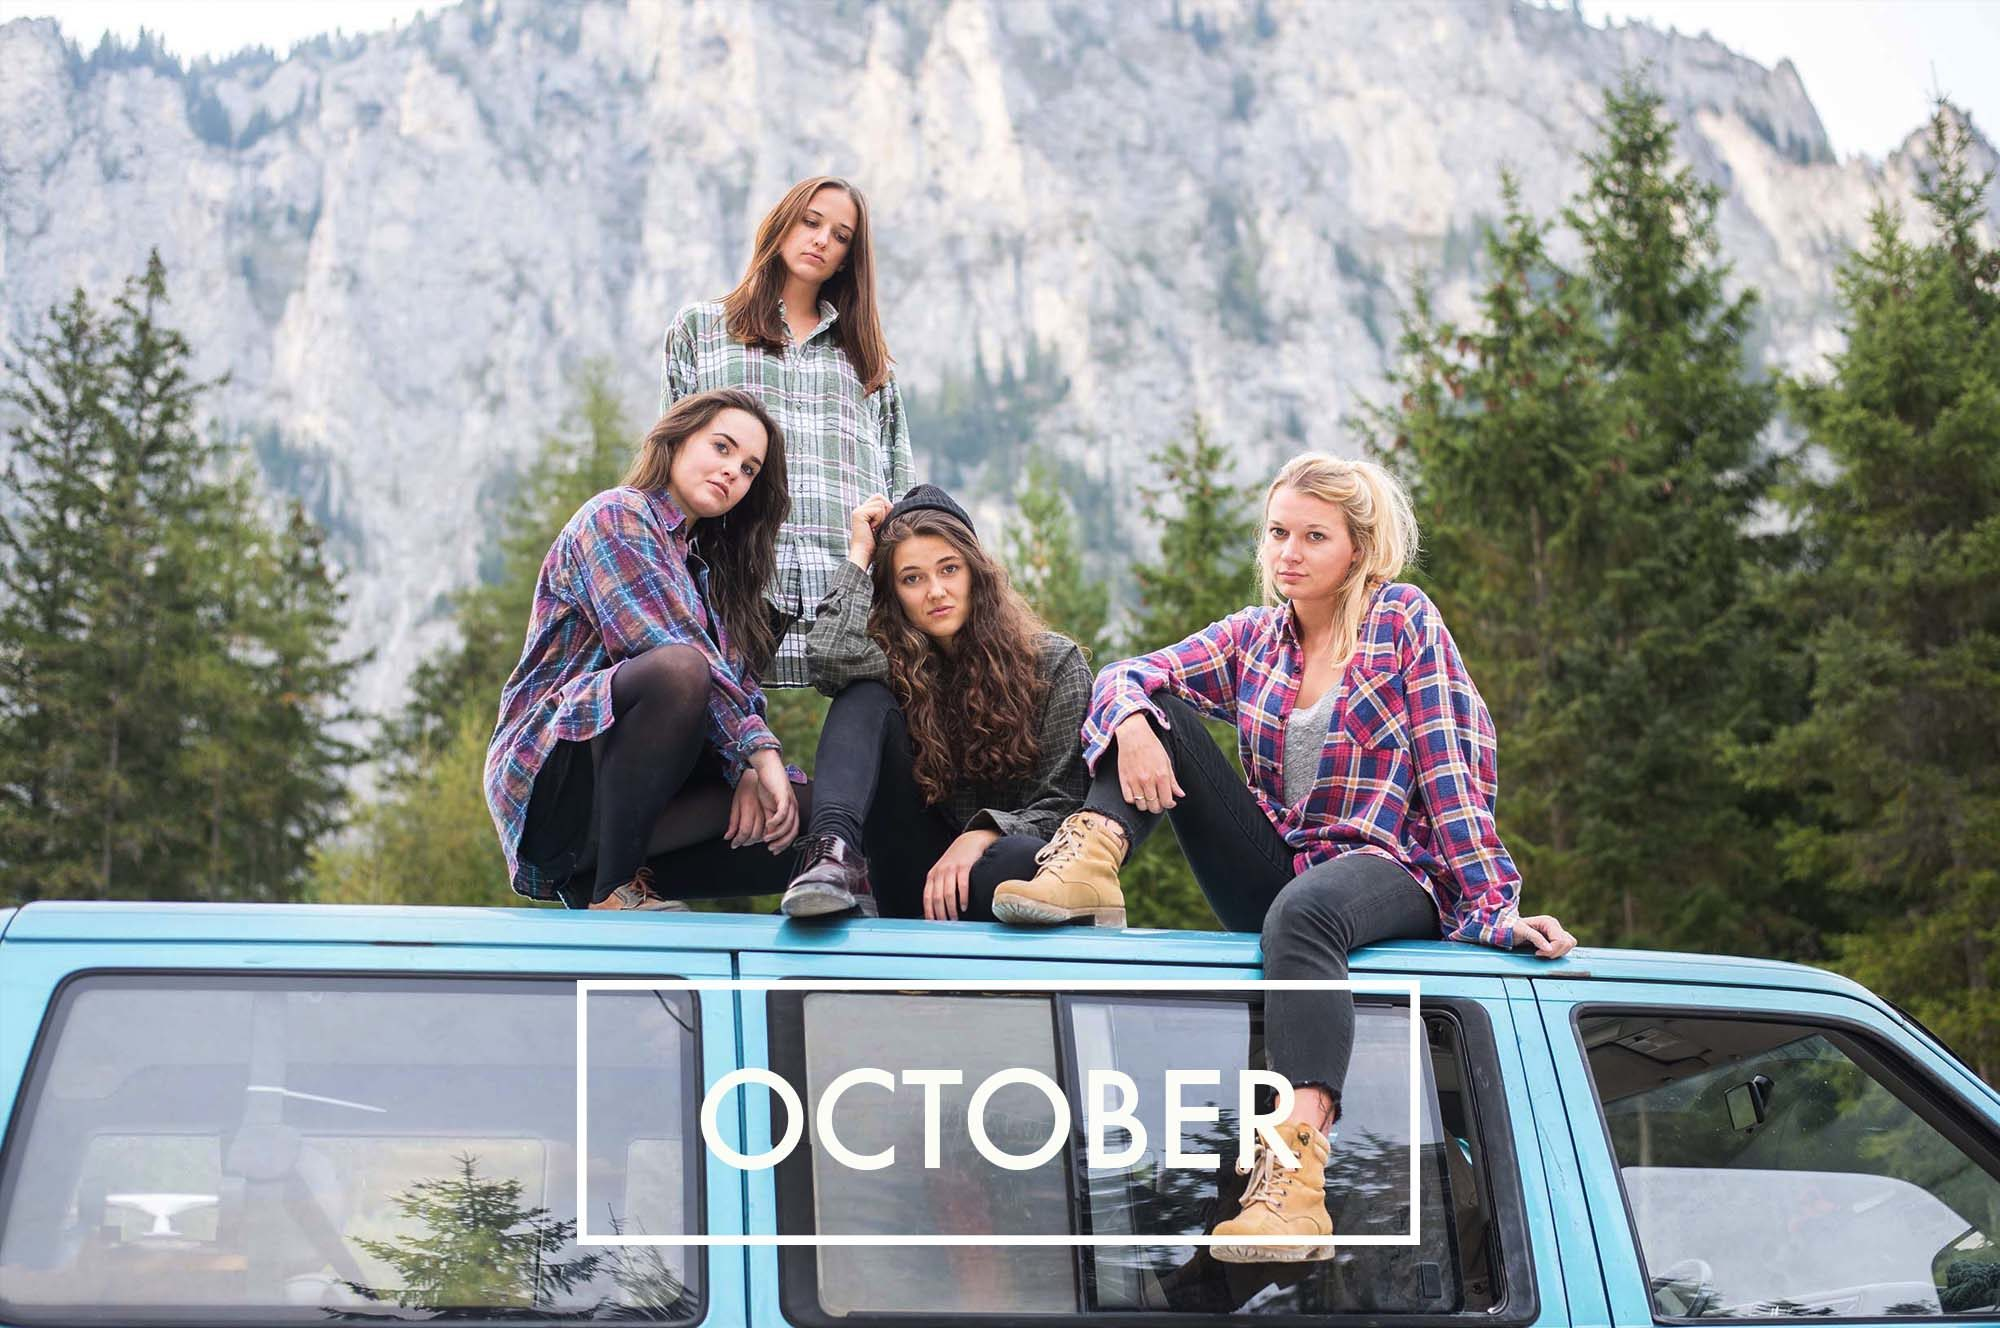 Girl Gang Band VW Bus cool Holzfällerhemd Jahresrückblick 2016 Dogdays of Summer Vintage onlineshop graz Österreich Retro